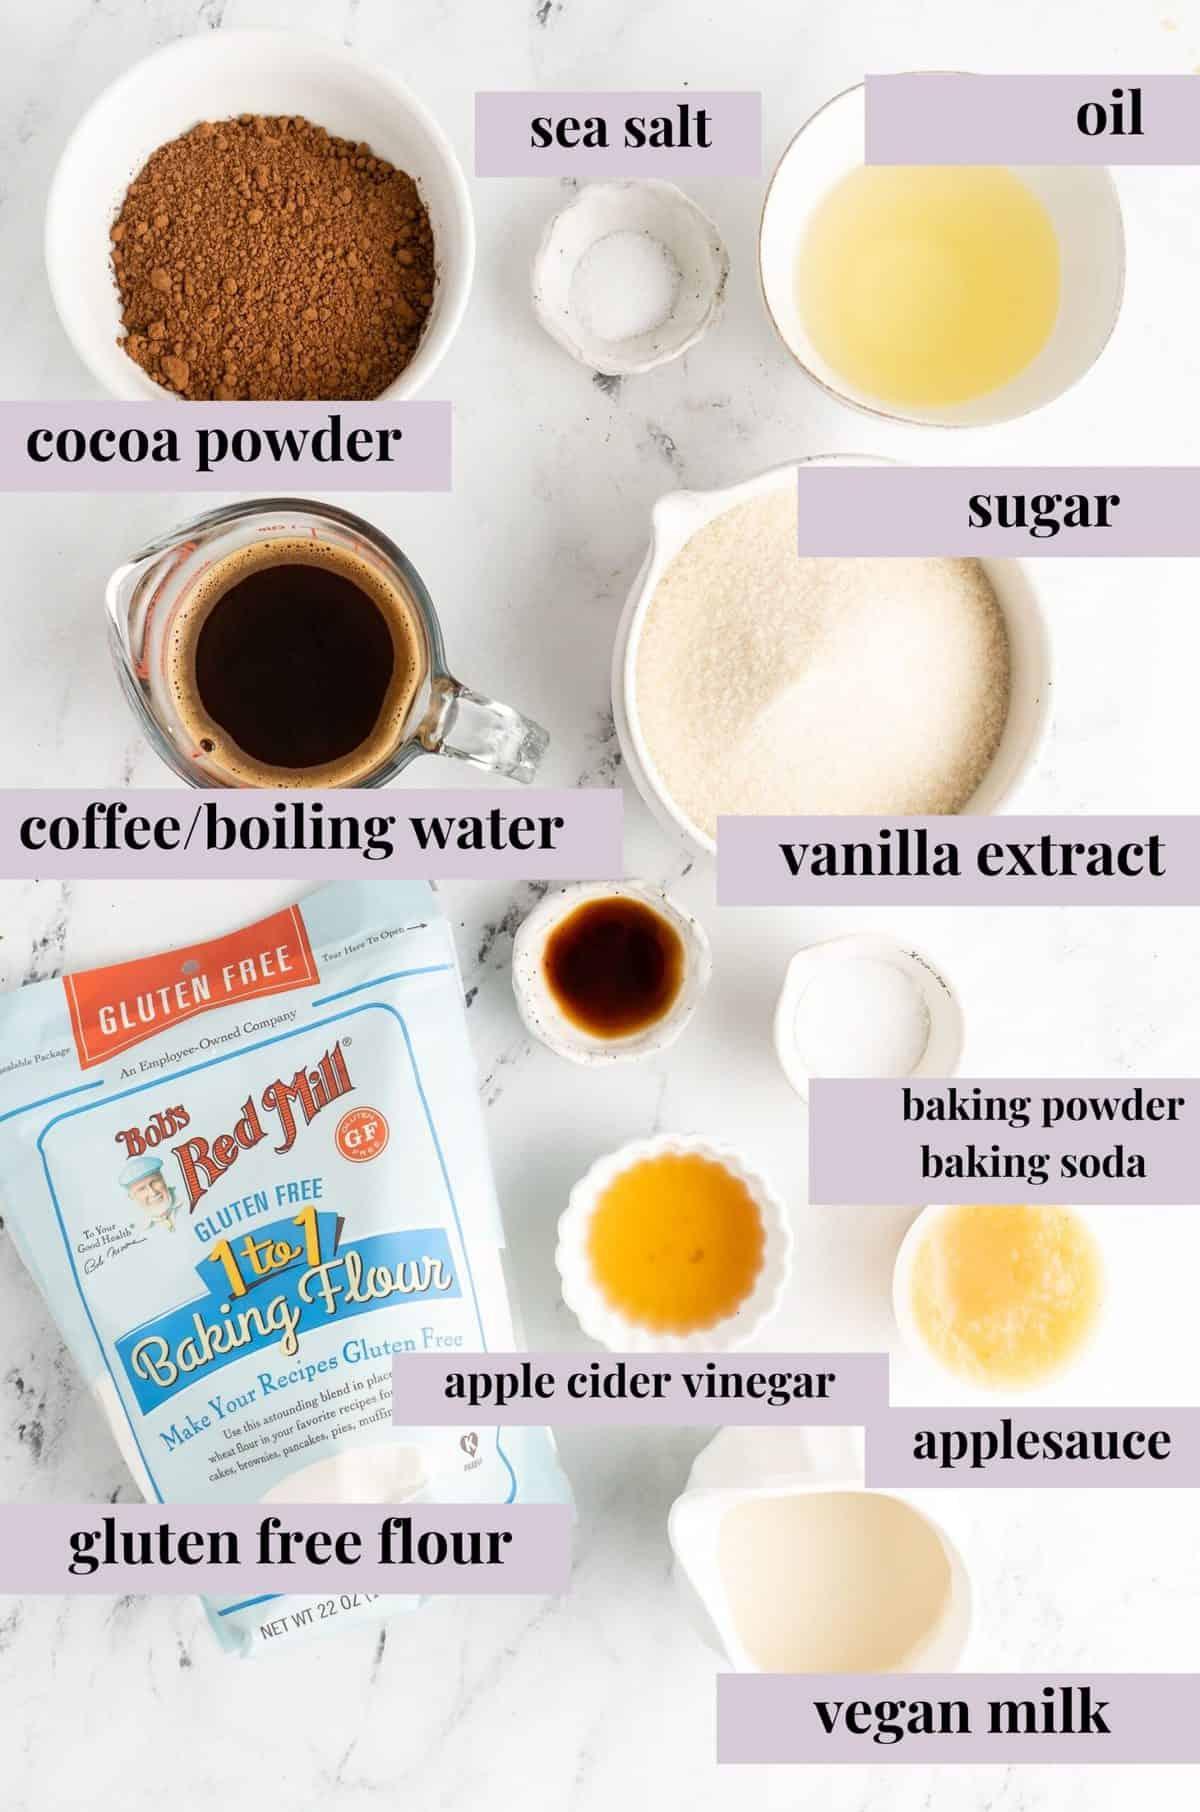 ingredients to make gluten free chocolate cake